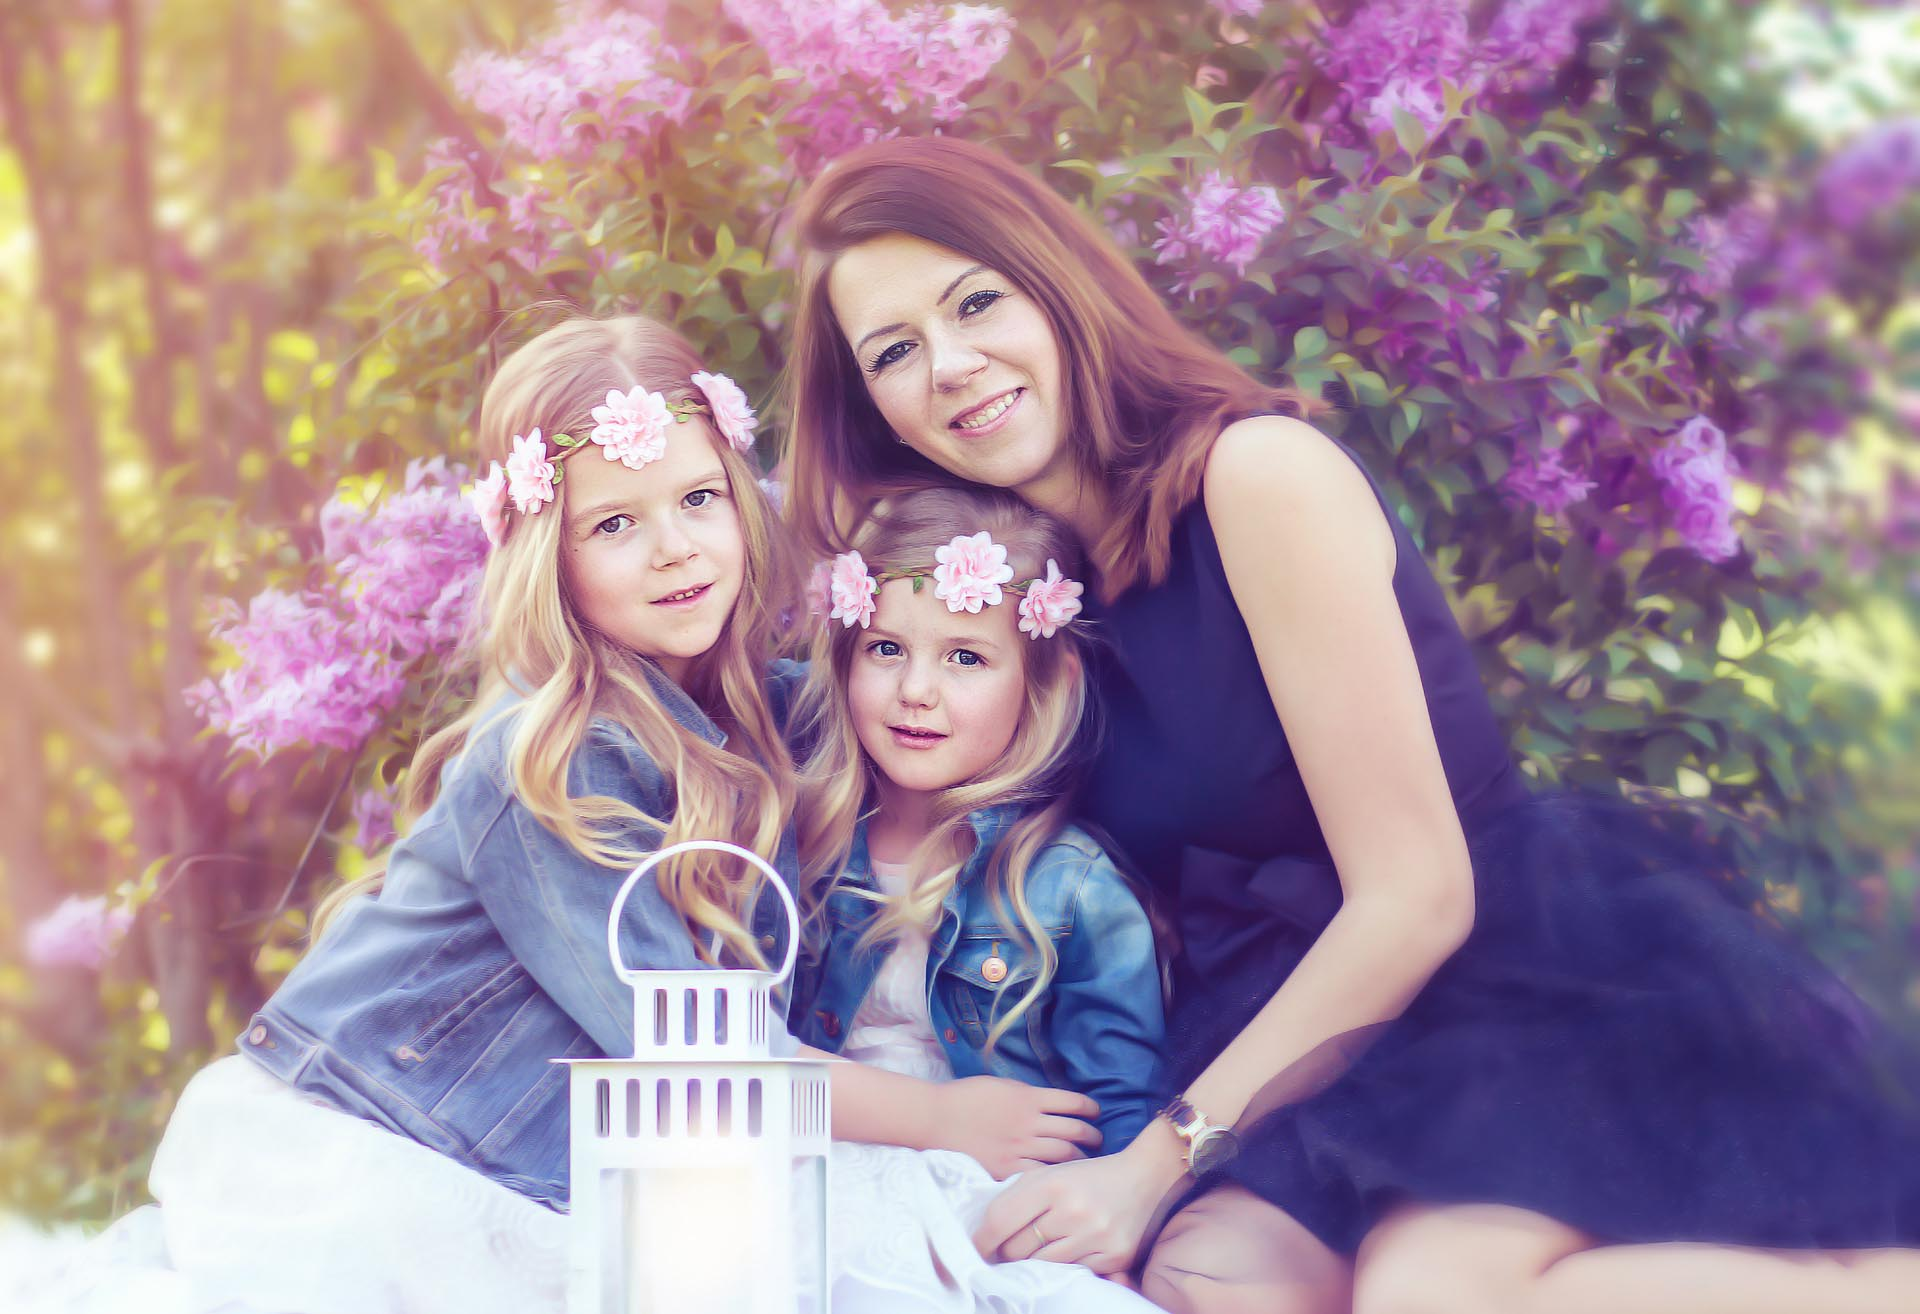 Kinderfotografie Familienfotografie